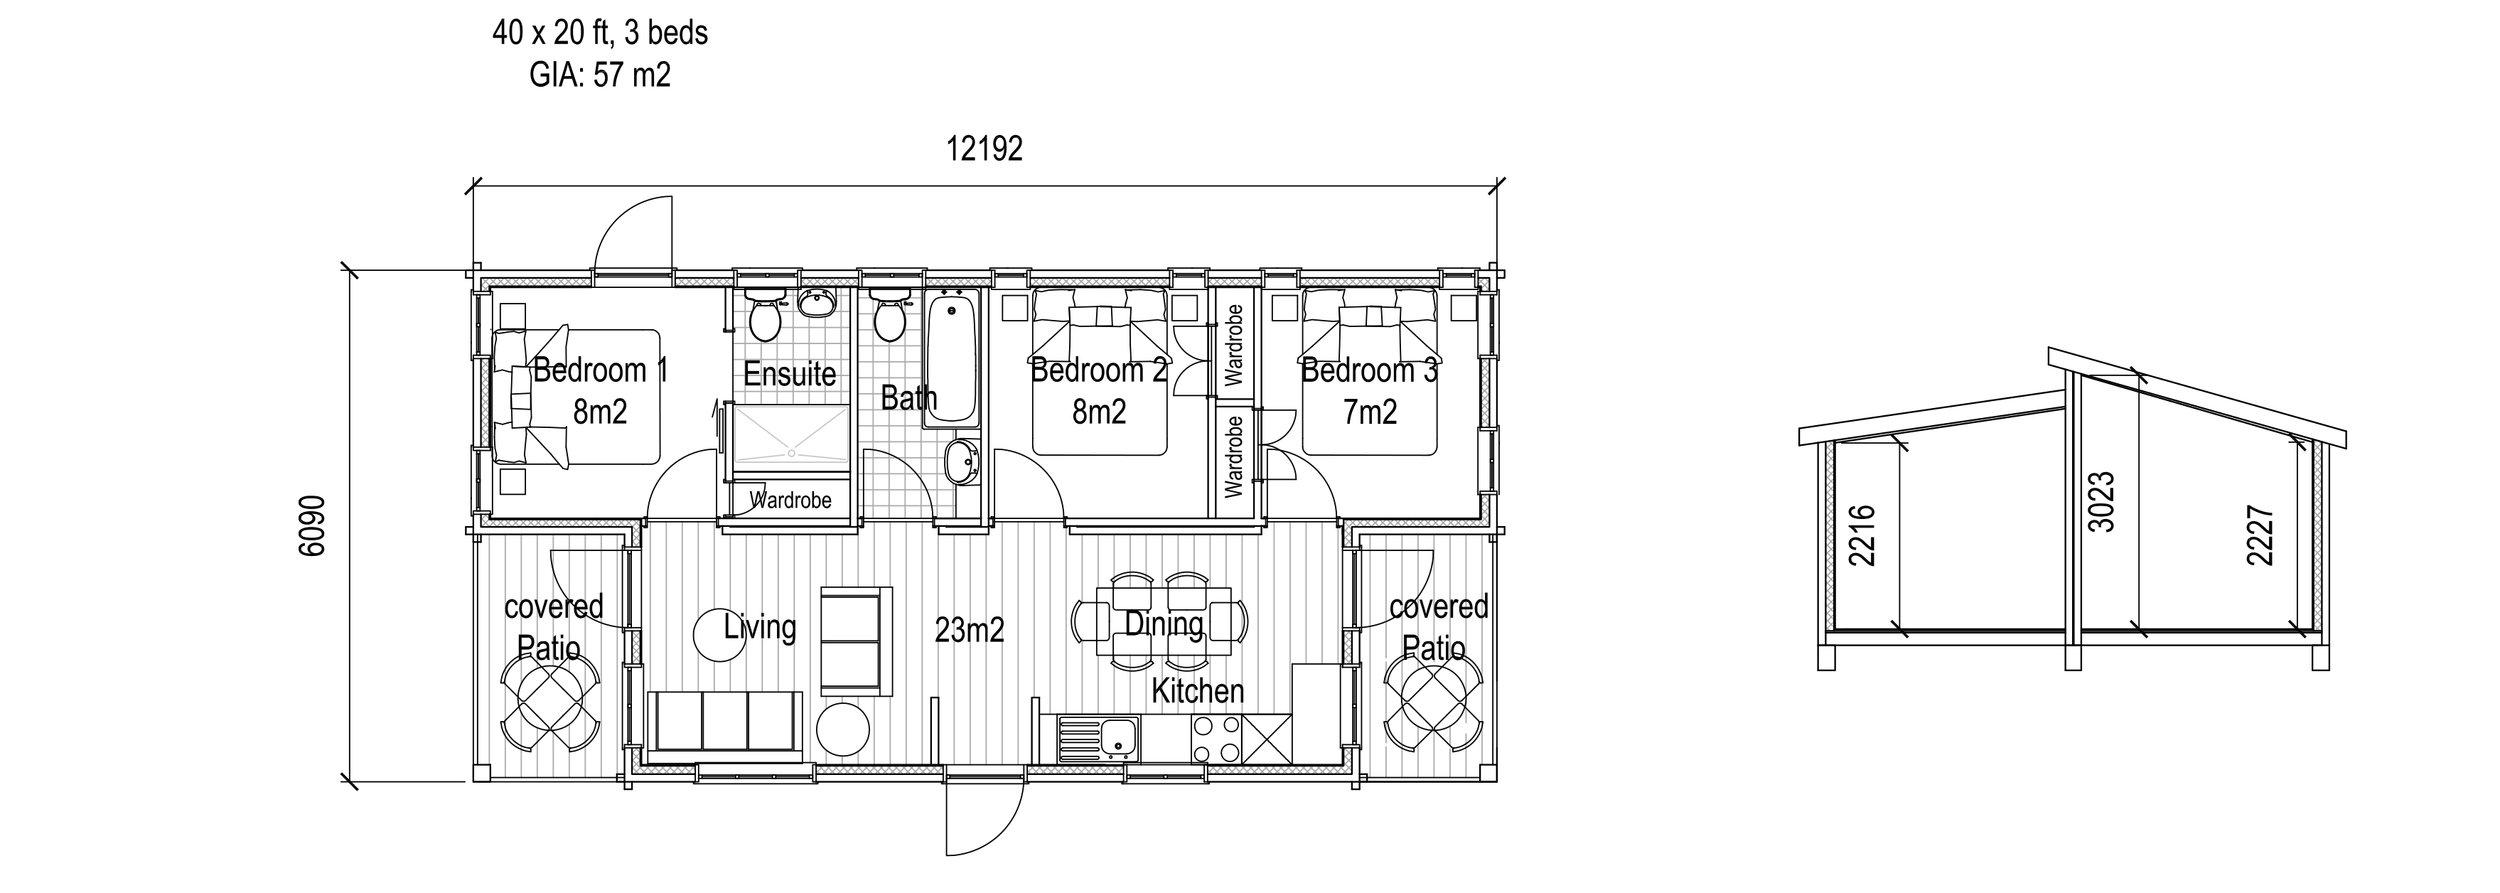 40-20 3bed plans.jpg